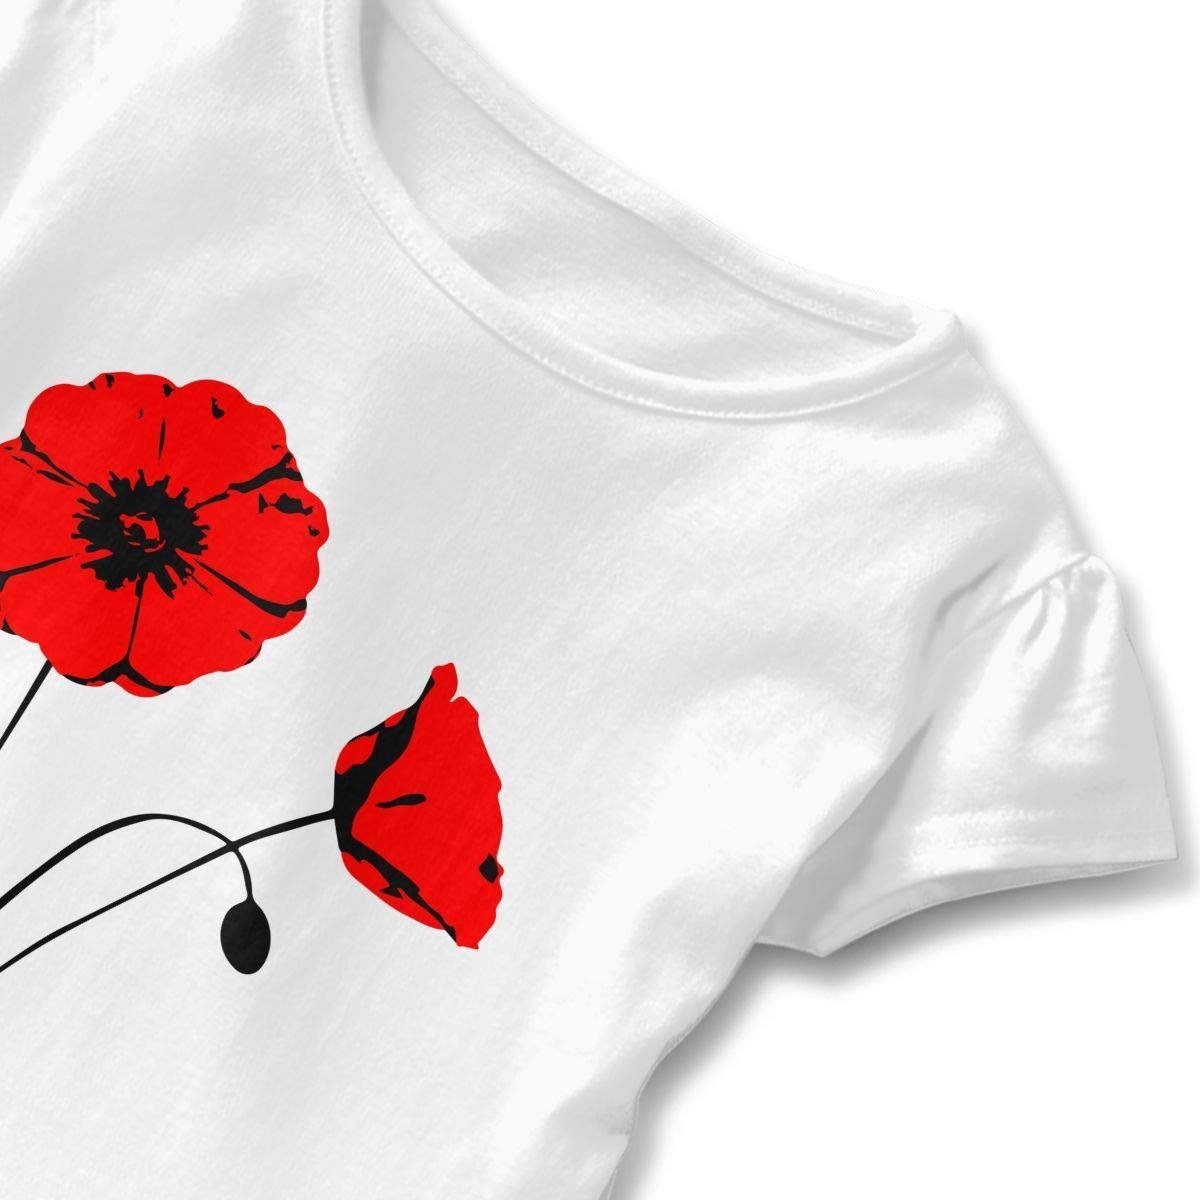 lu fangfangc Girls Short Sleeve Poppy Flower T-Shirts Fashion Blouse Clothes with Flounces 2-6T